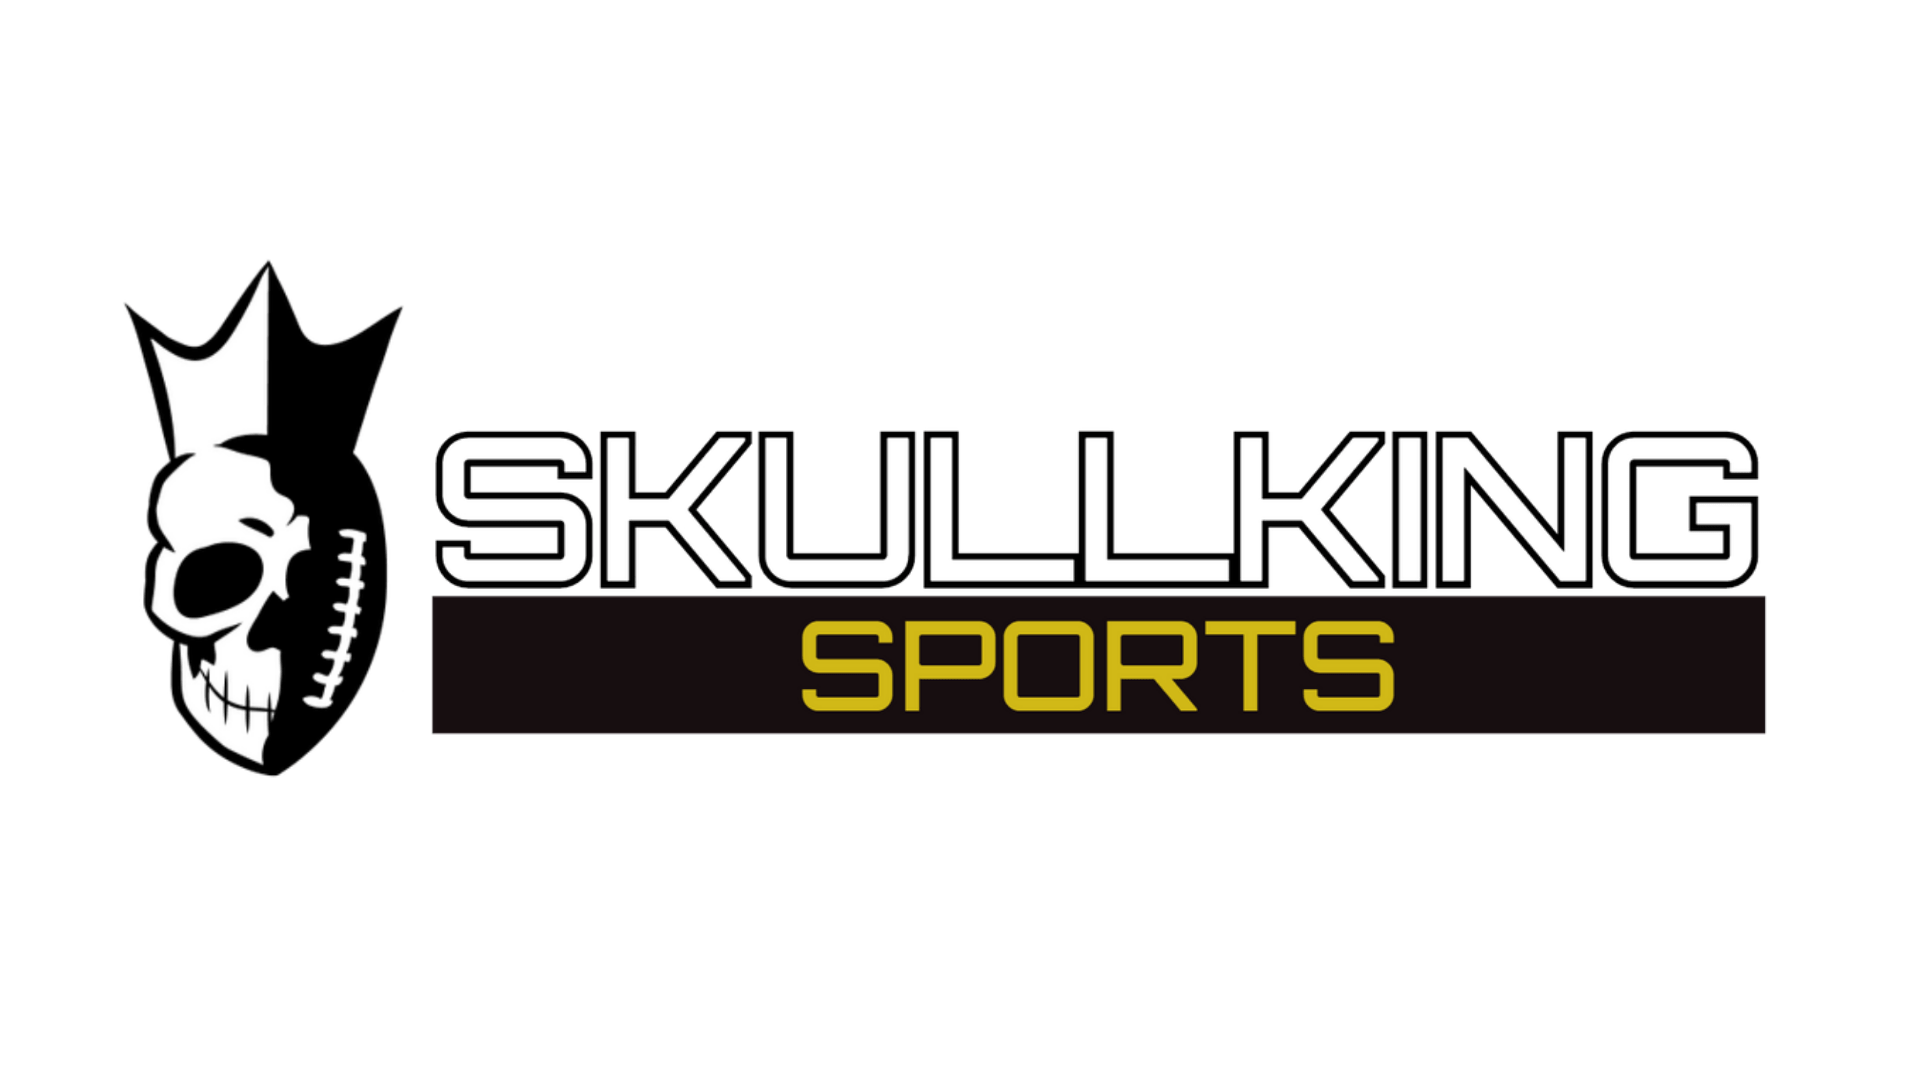 SkullKing Sports